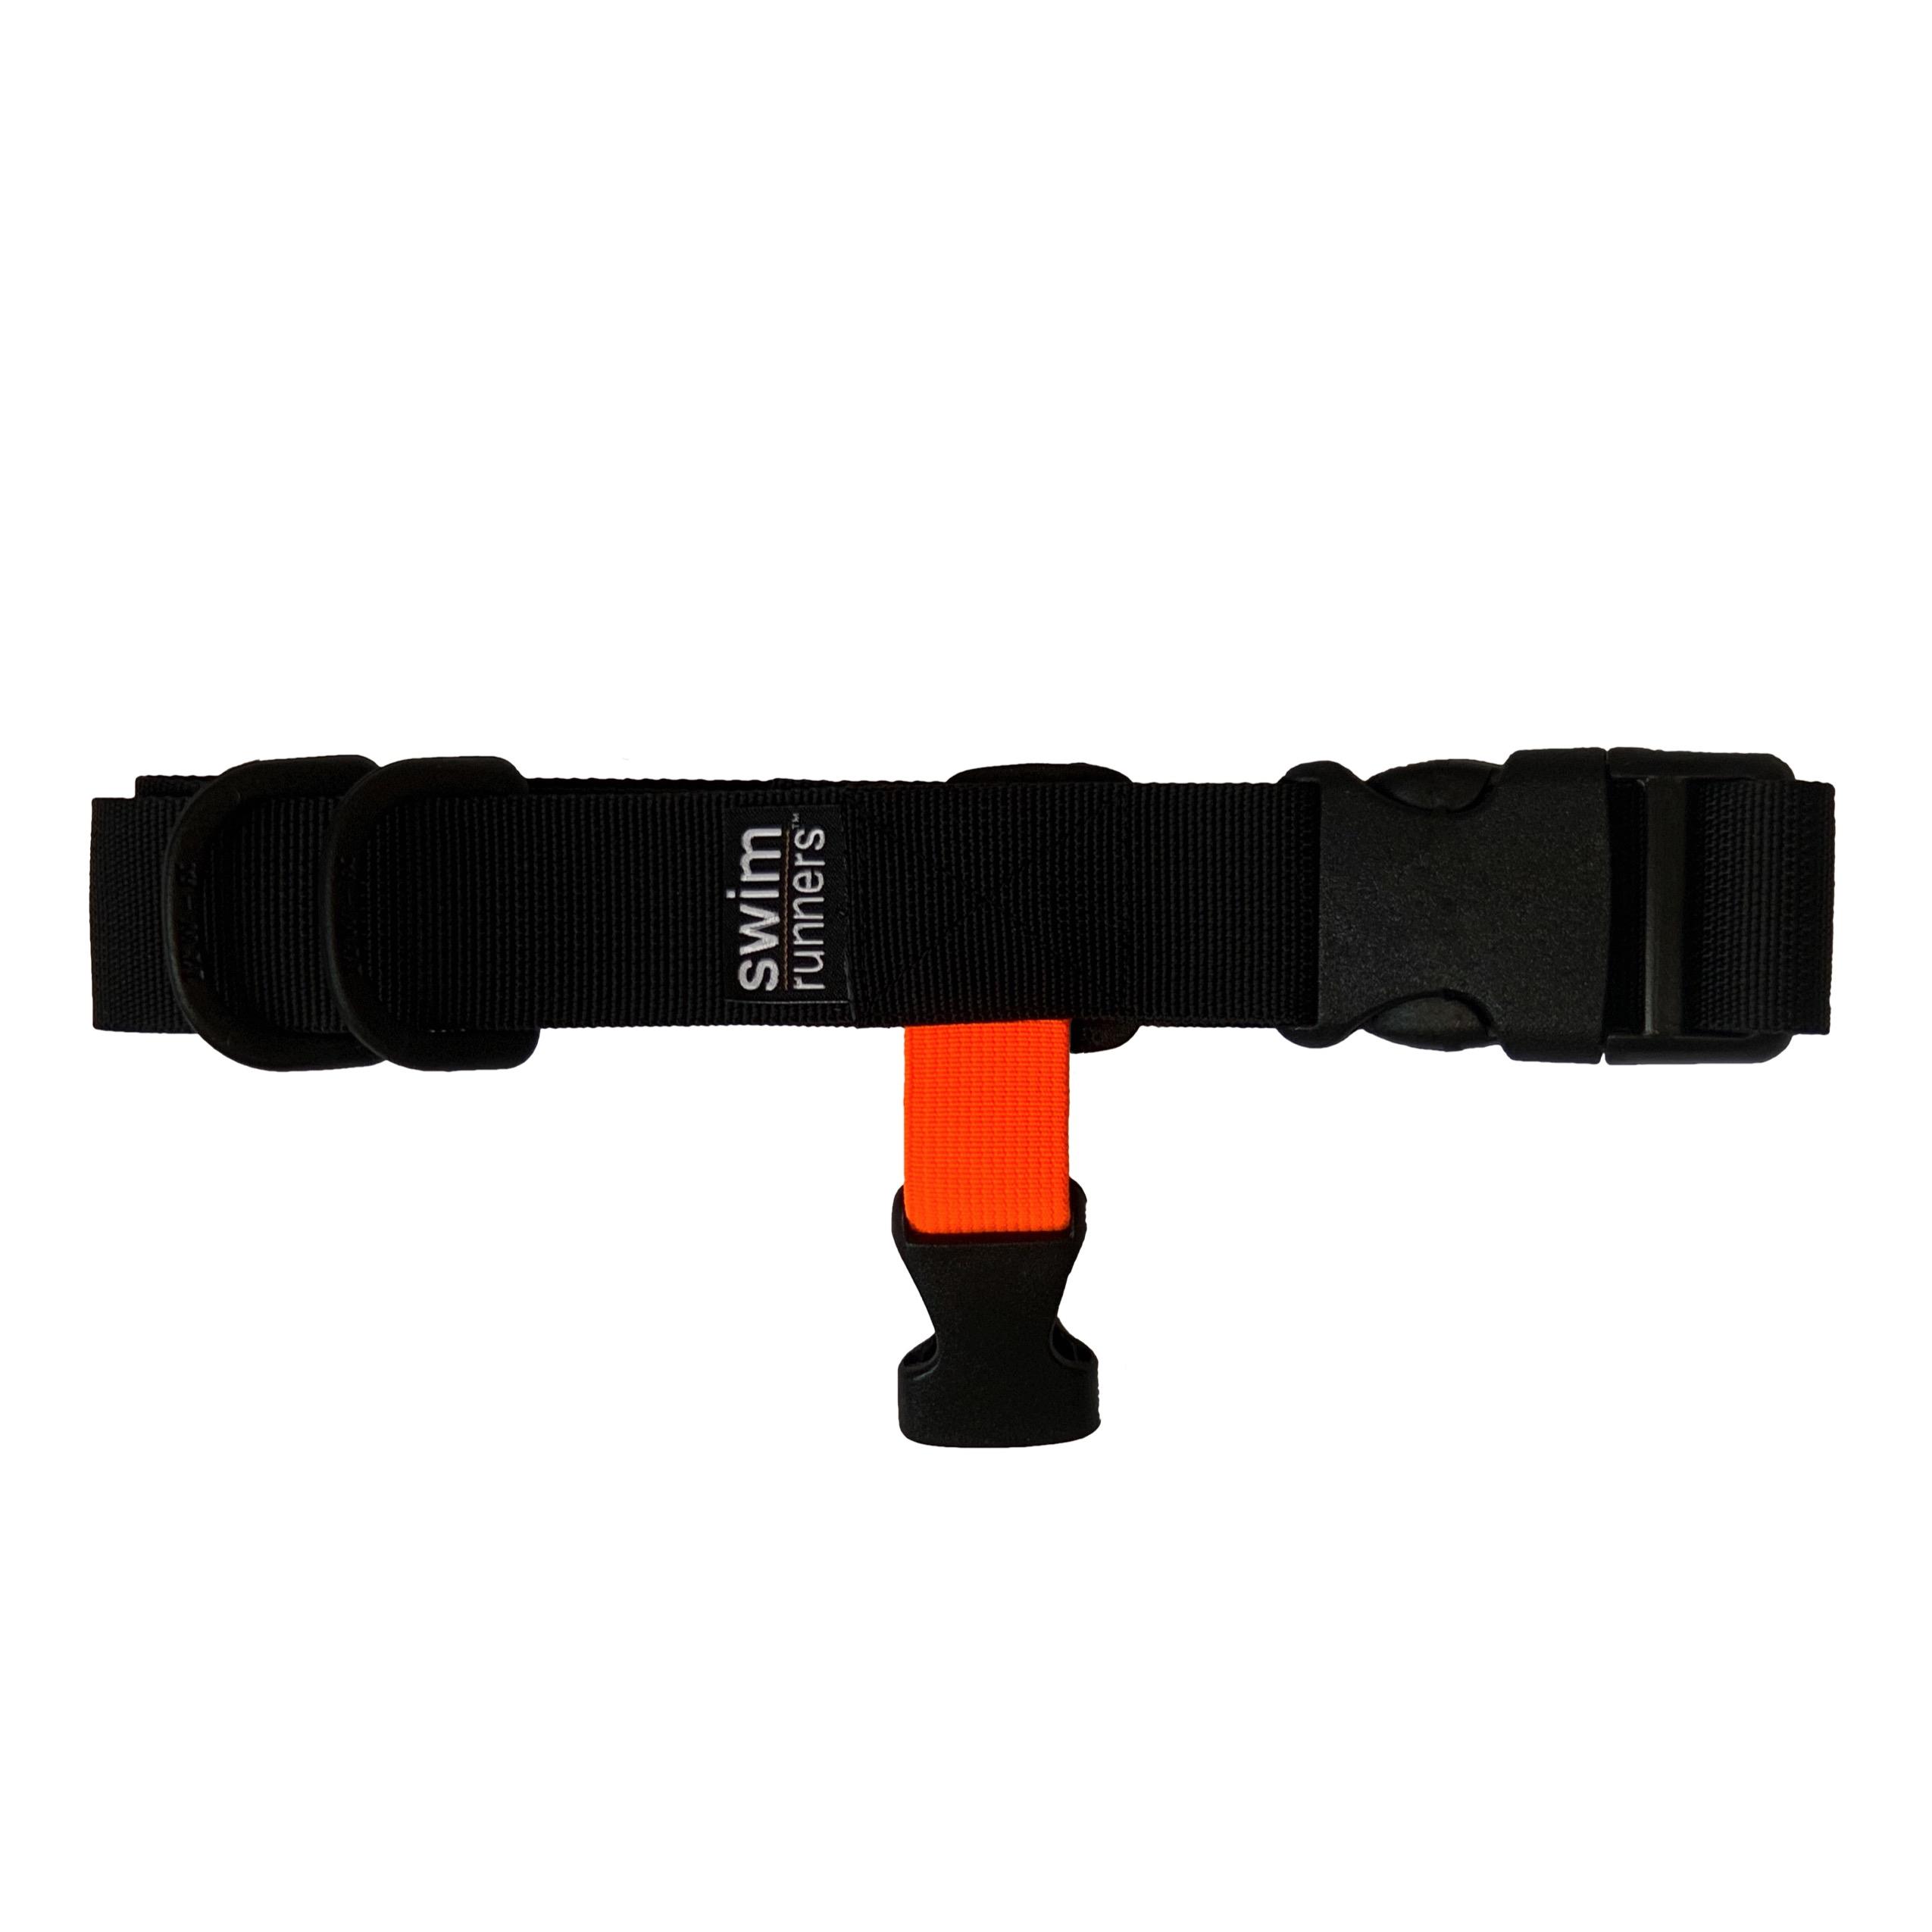 SWIMRUNNERS™ Pullbelt support light -Foto: SwimRunners